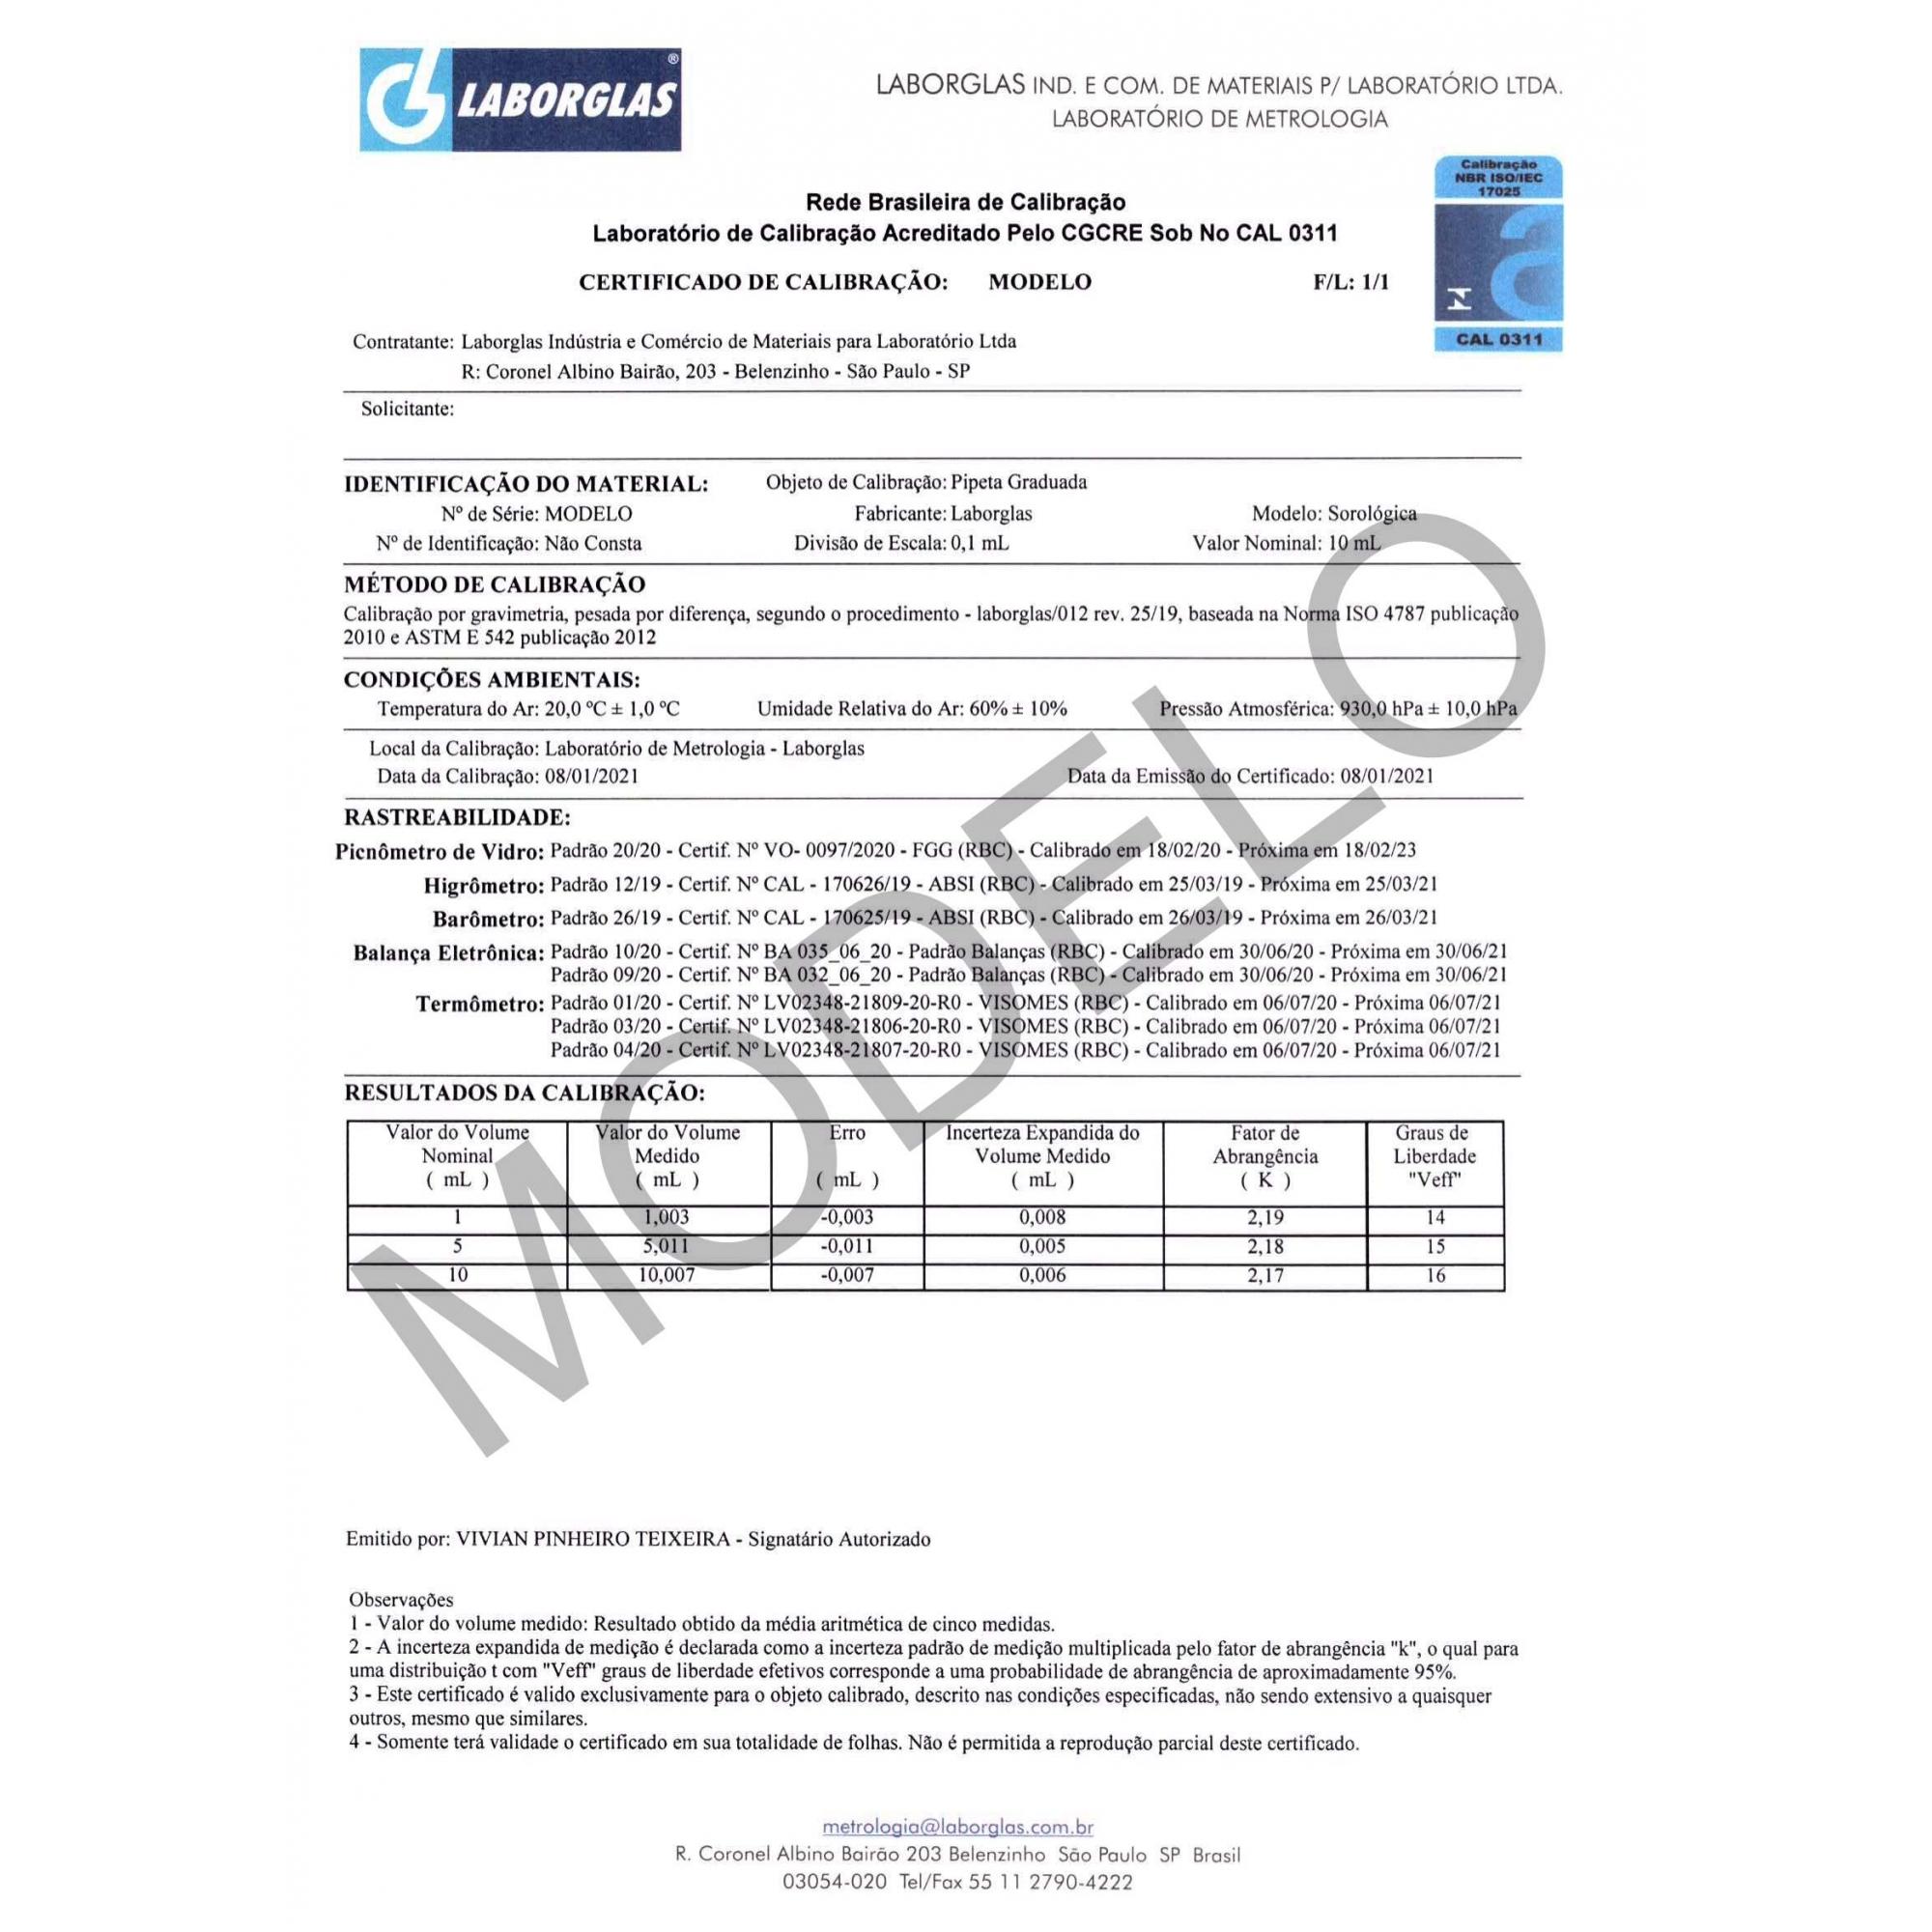 PIPETA GRAD. SOROL. ESGOT. TOTAL 2 ML 1/100 COM CERTIFICADO RBC - Laborglas - Cód. 9434309-R